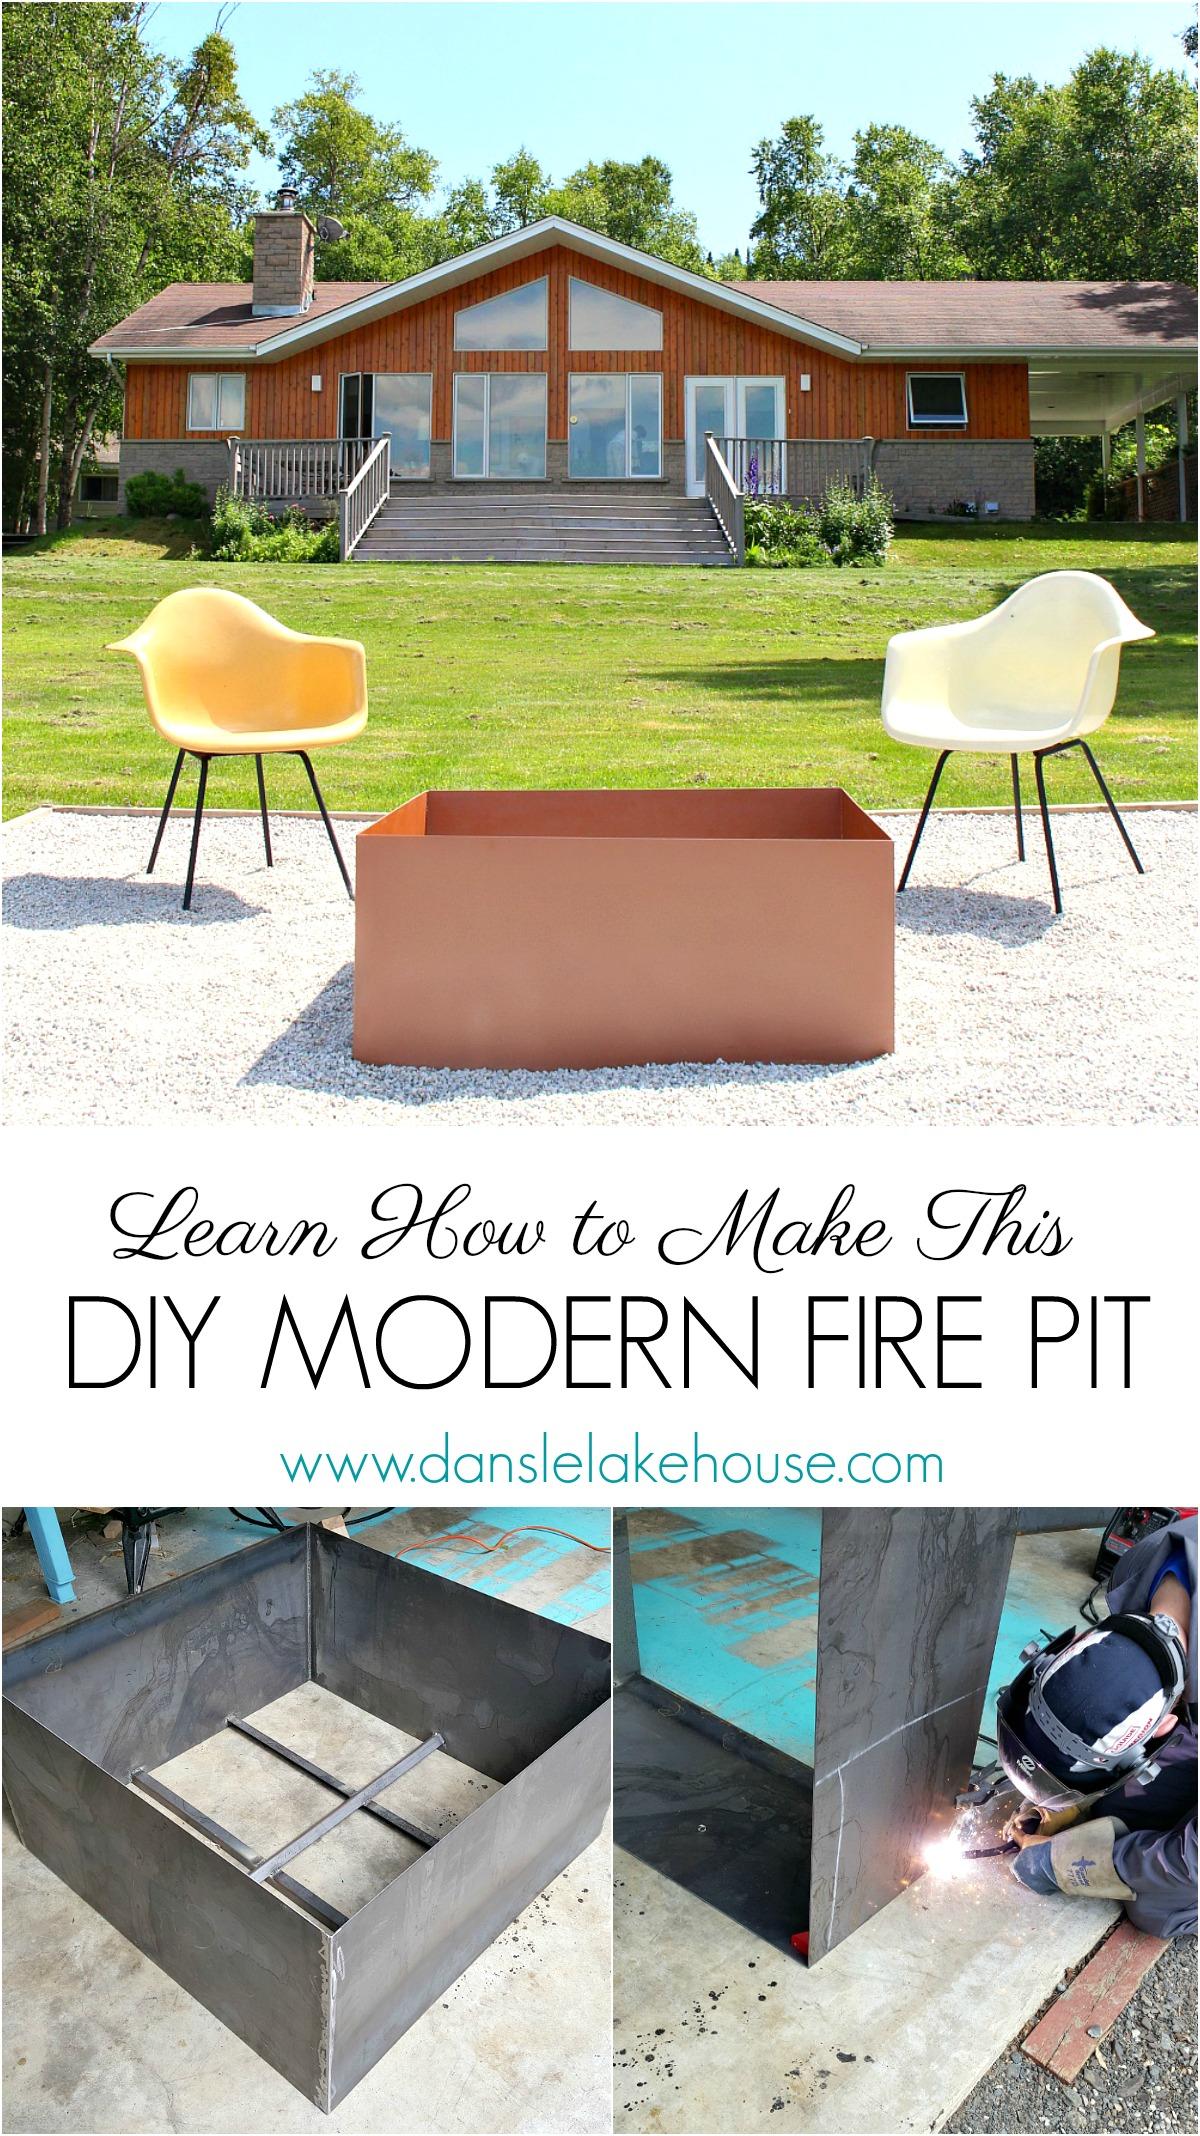 Welded DIY Fire Pit   Modern Fire Pit Makeover for Cute Lake House   Dans le Lakehouse #firepit #diy #diyfirepit #weldingtutorials #welding